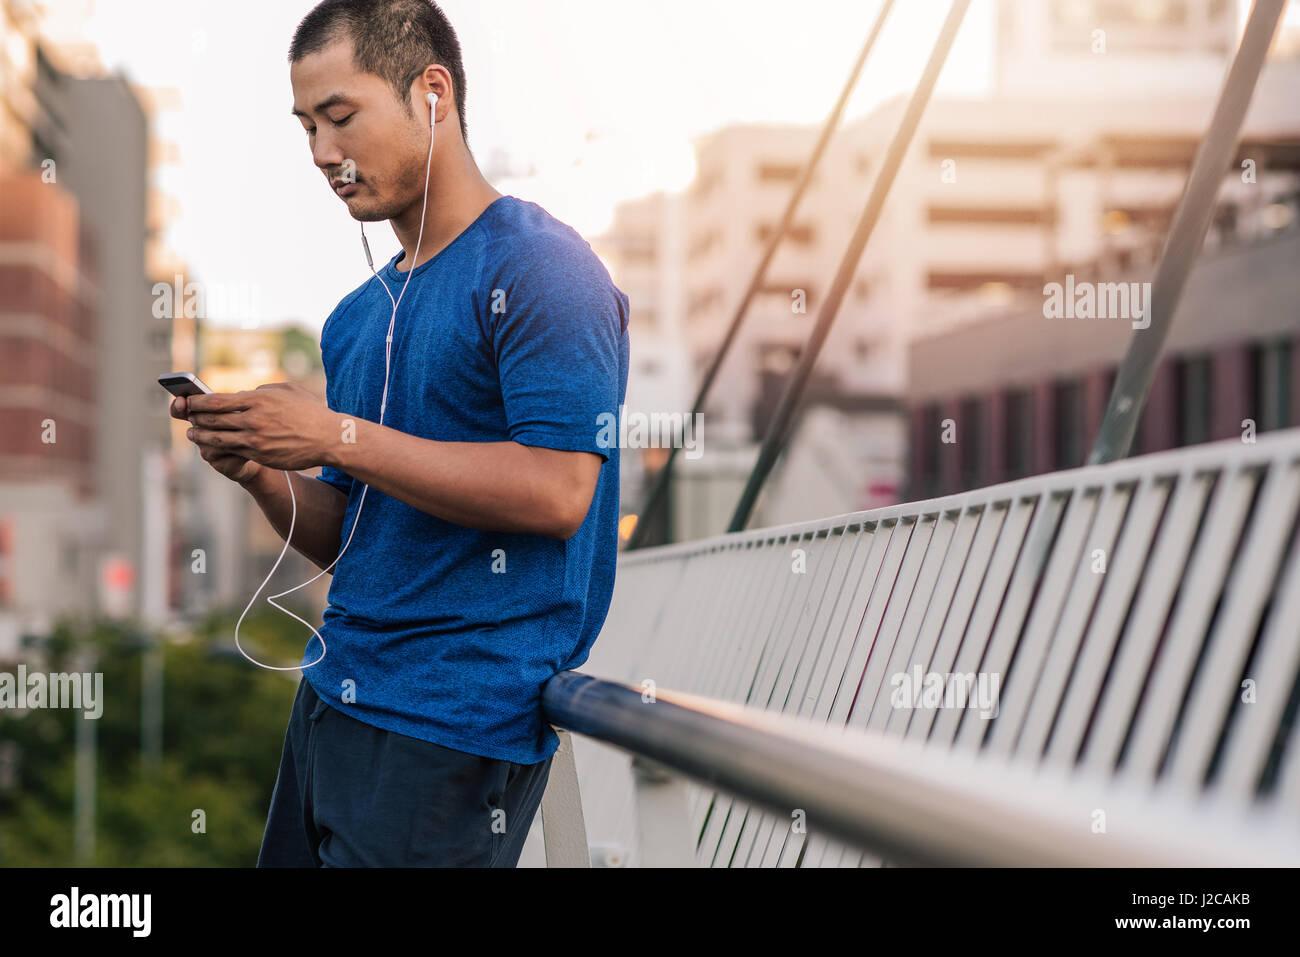 Sporty Asian man choosing music before a run - Stock Image